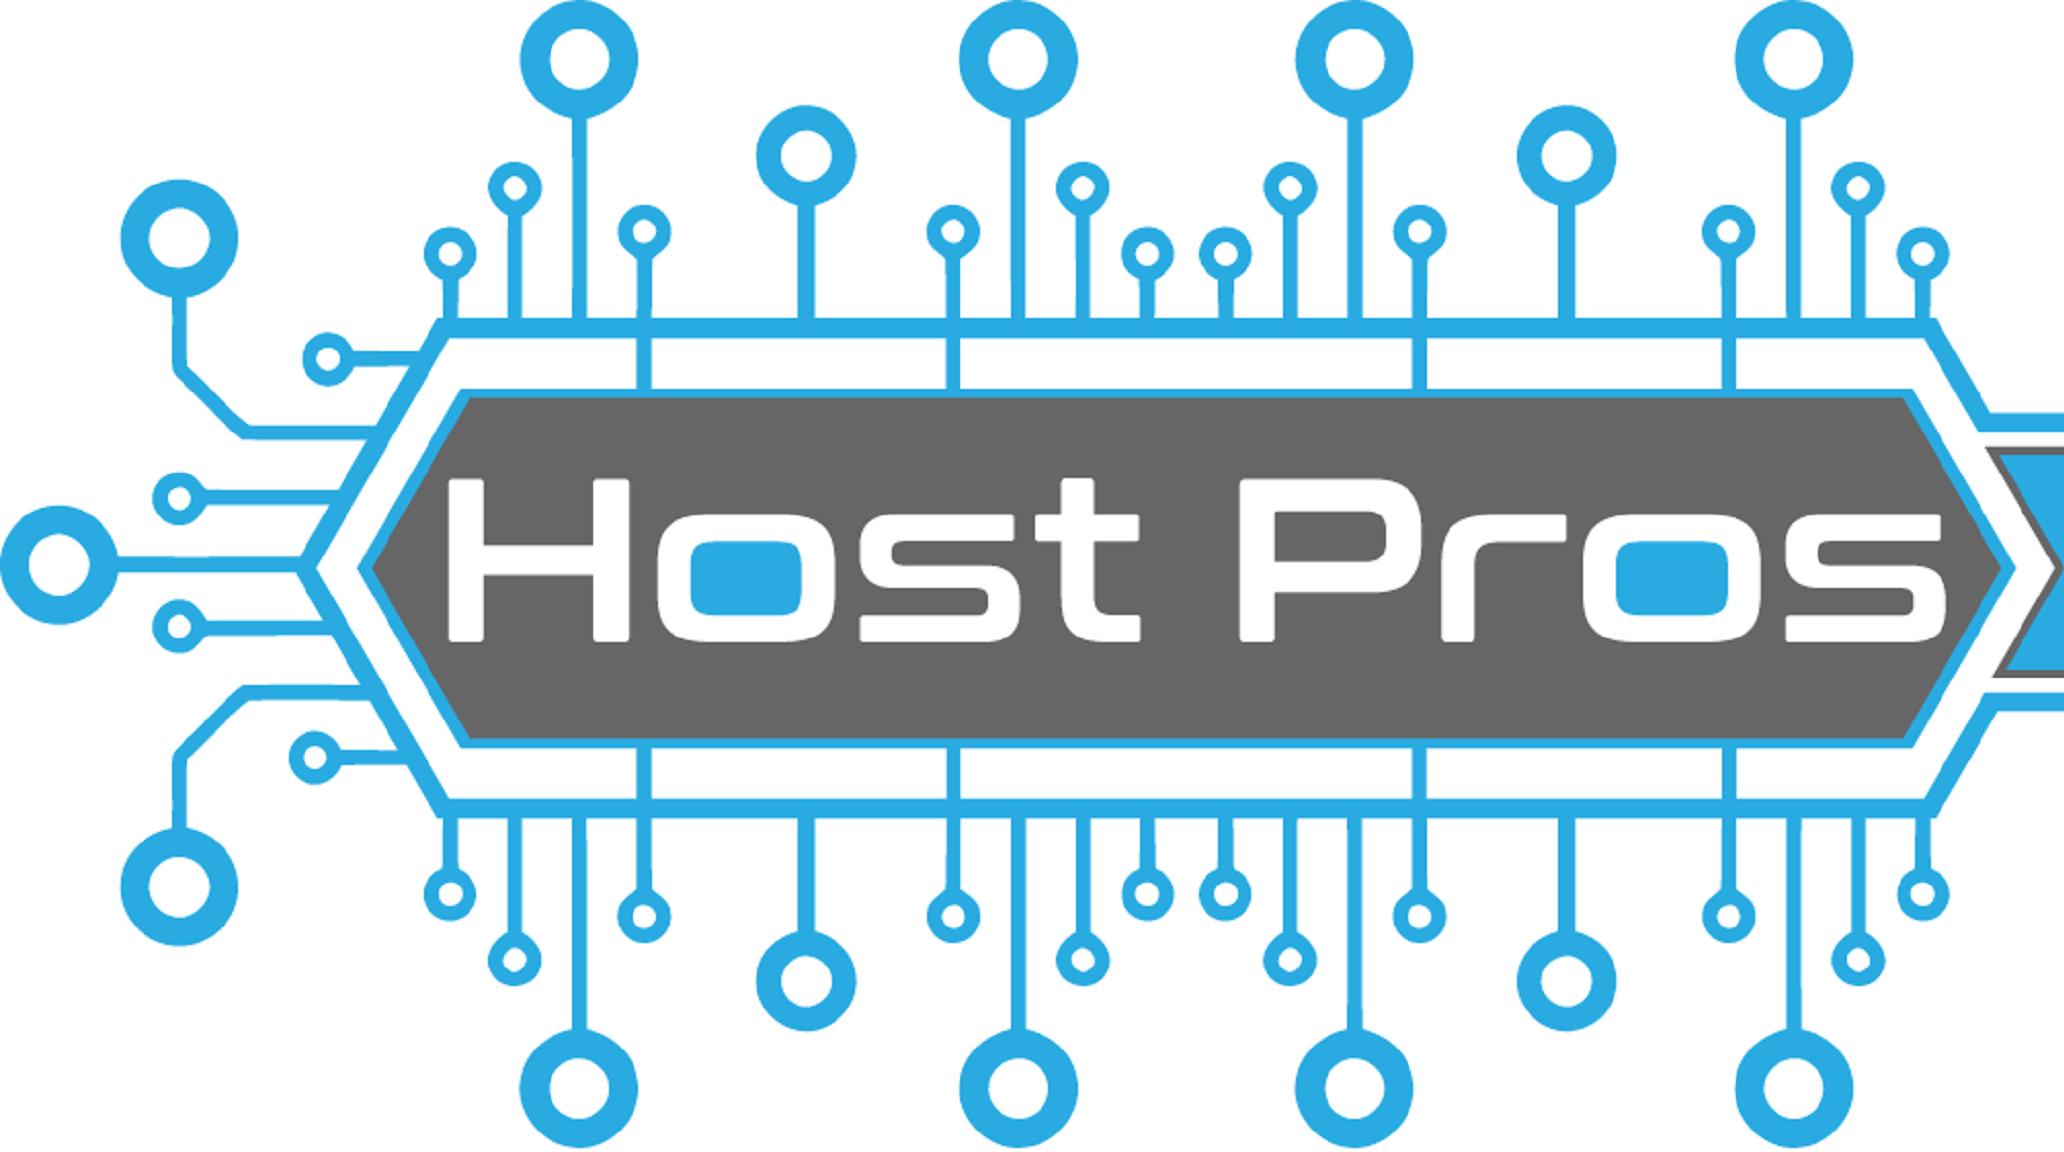 Host Pros